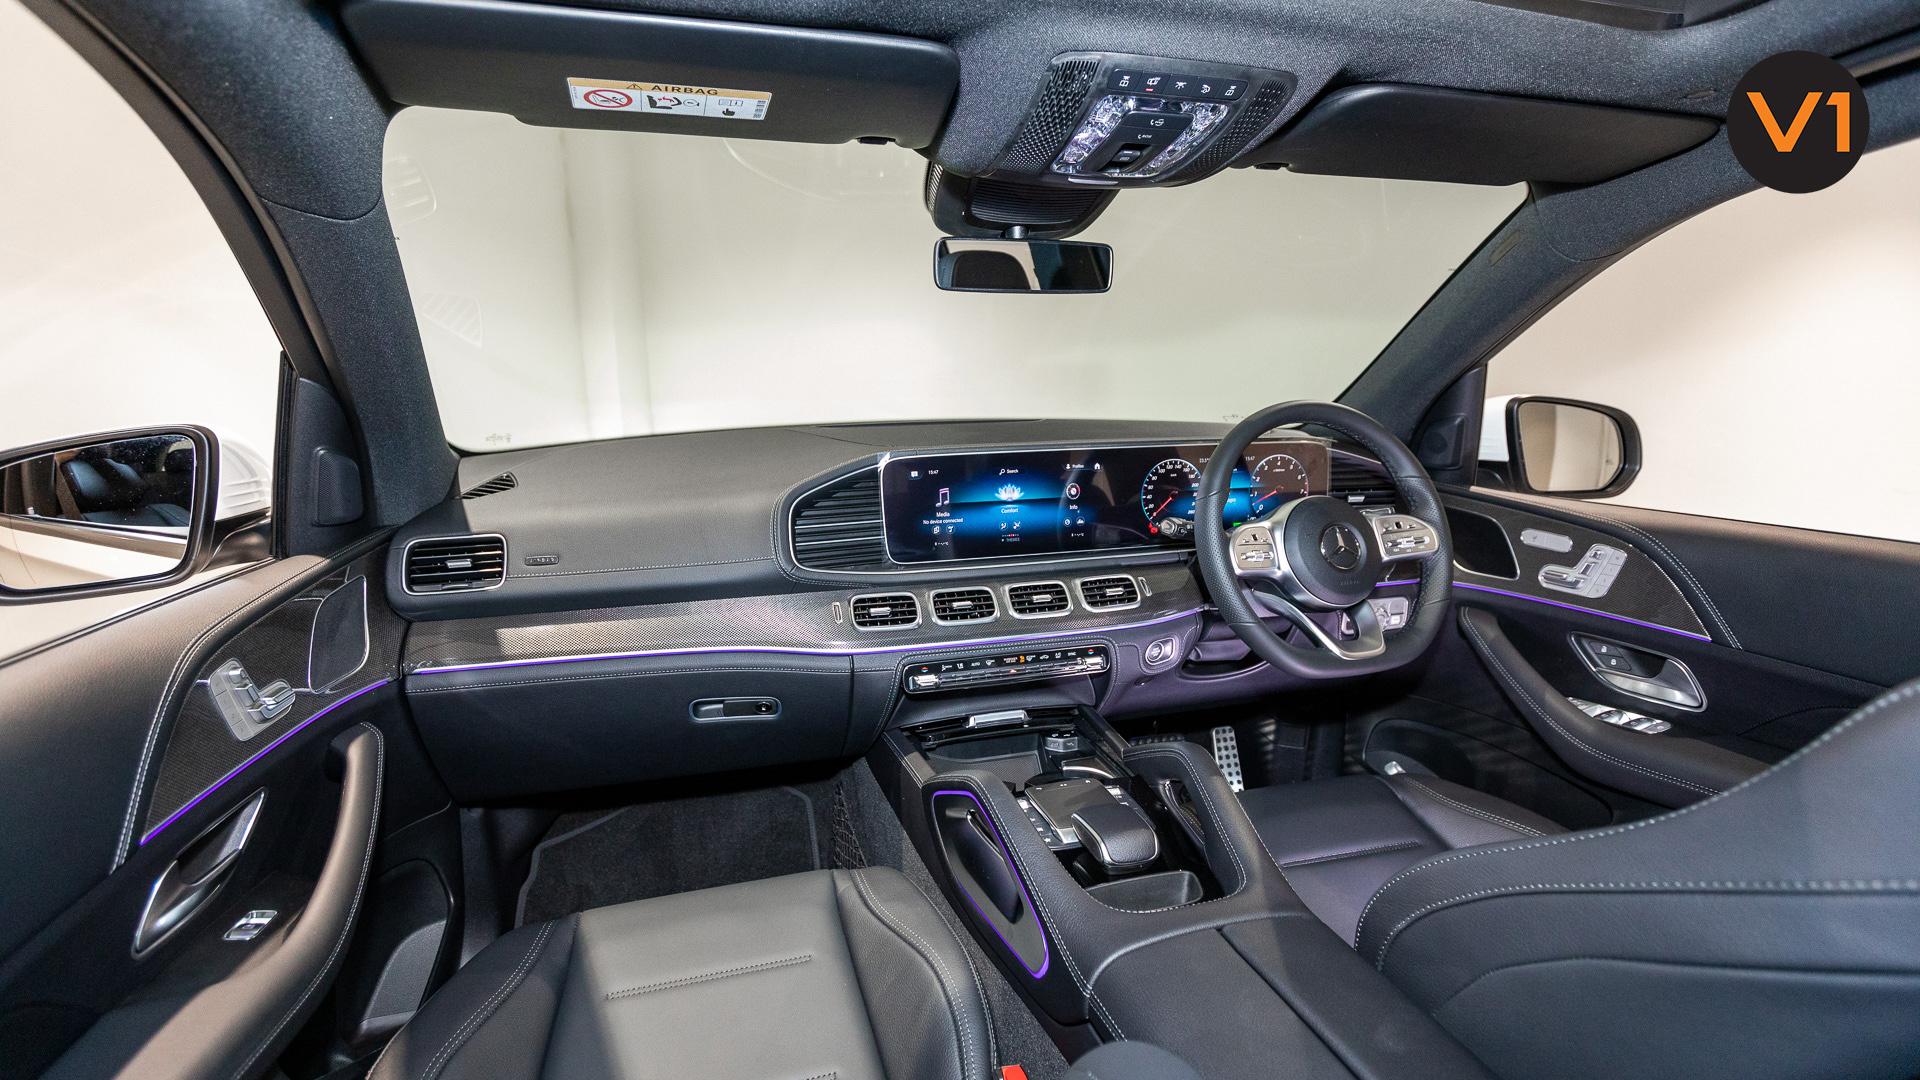 MERCEDES-BENZ GLE450 AMG 4MATIC LUXURY - Interior Dash 2